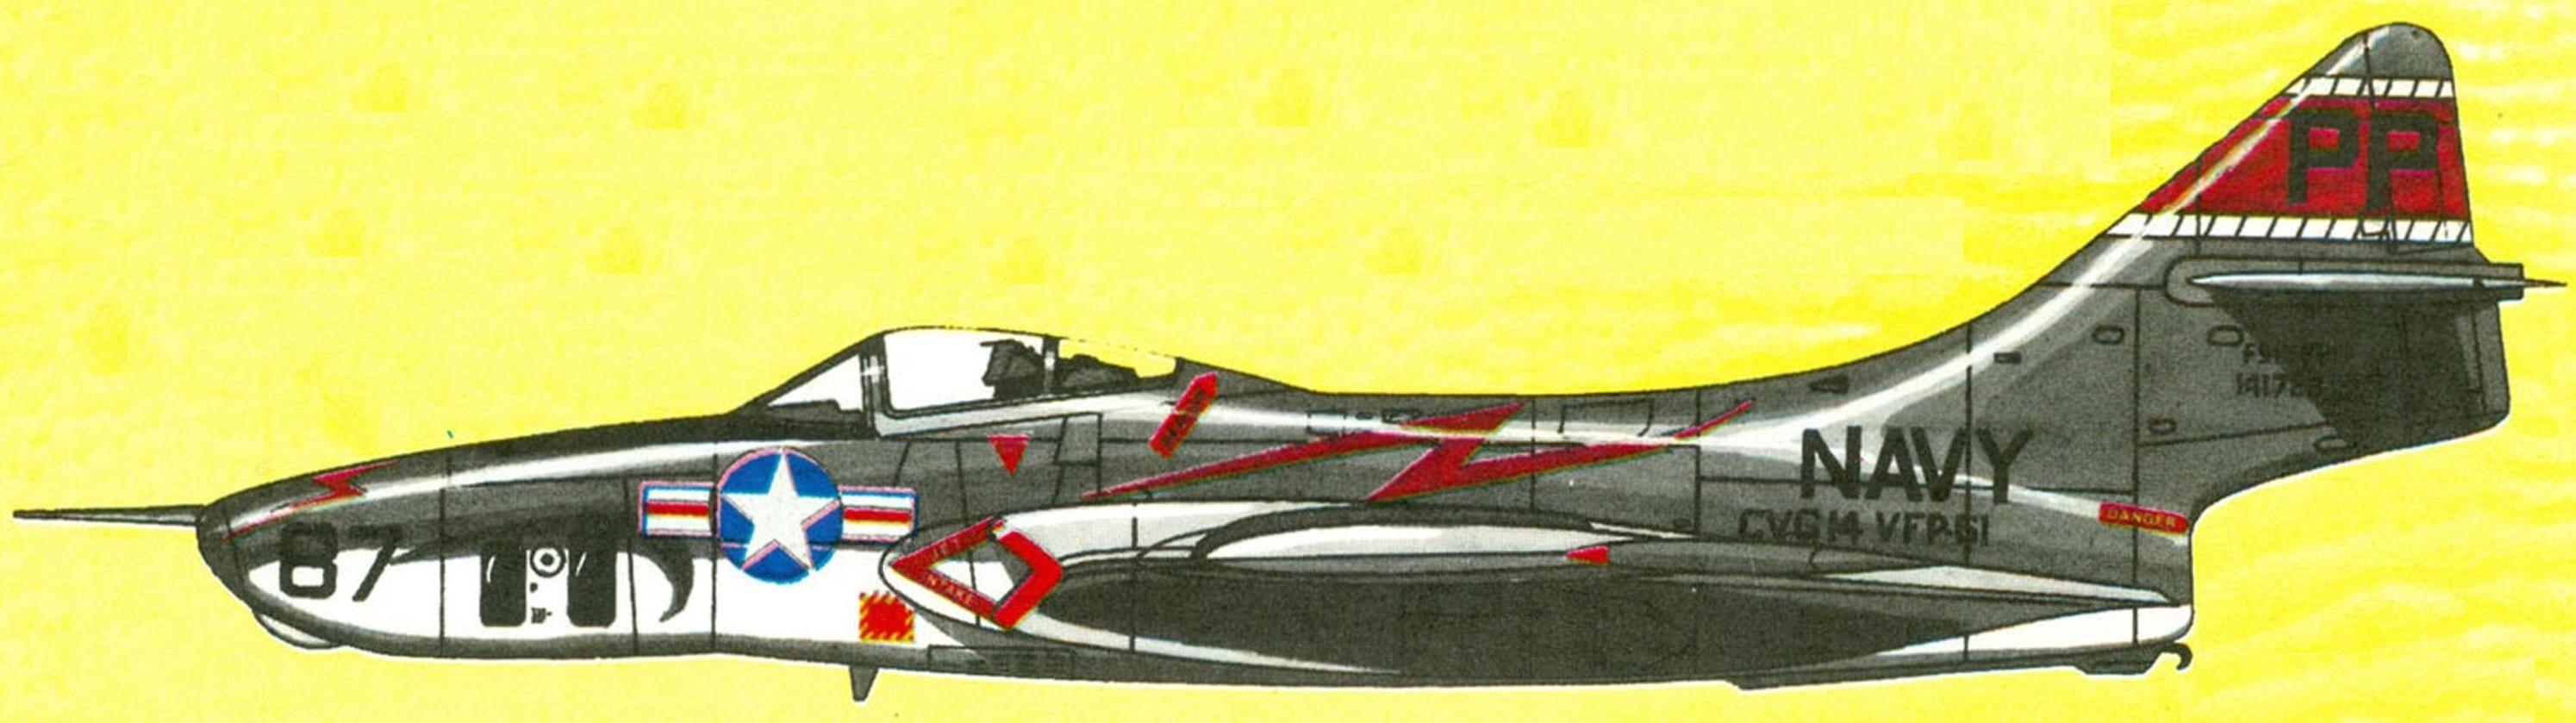 Разведчик RF-9J эскадрильи VFP-61, авианосец Hornet, 1957 г